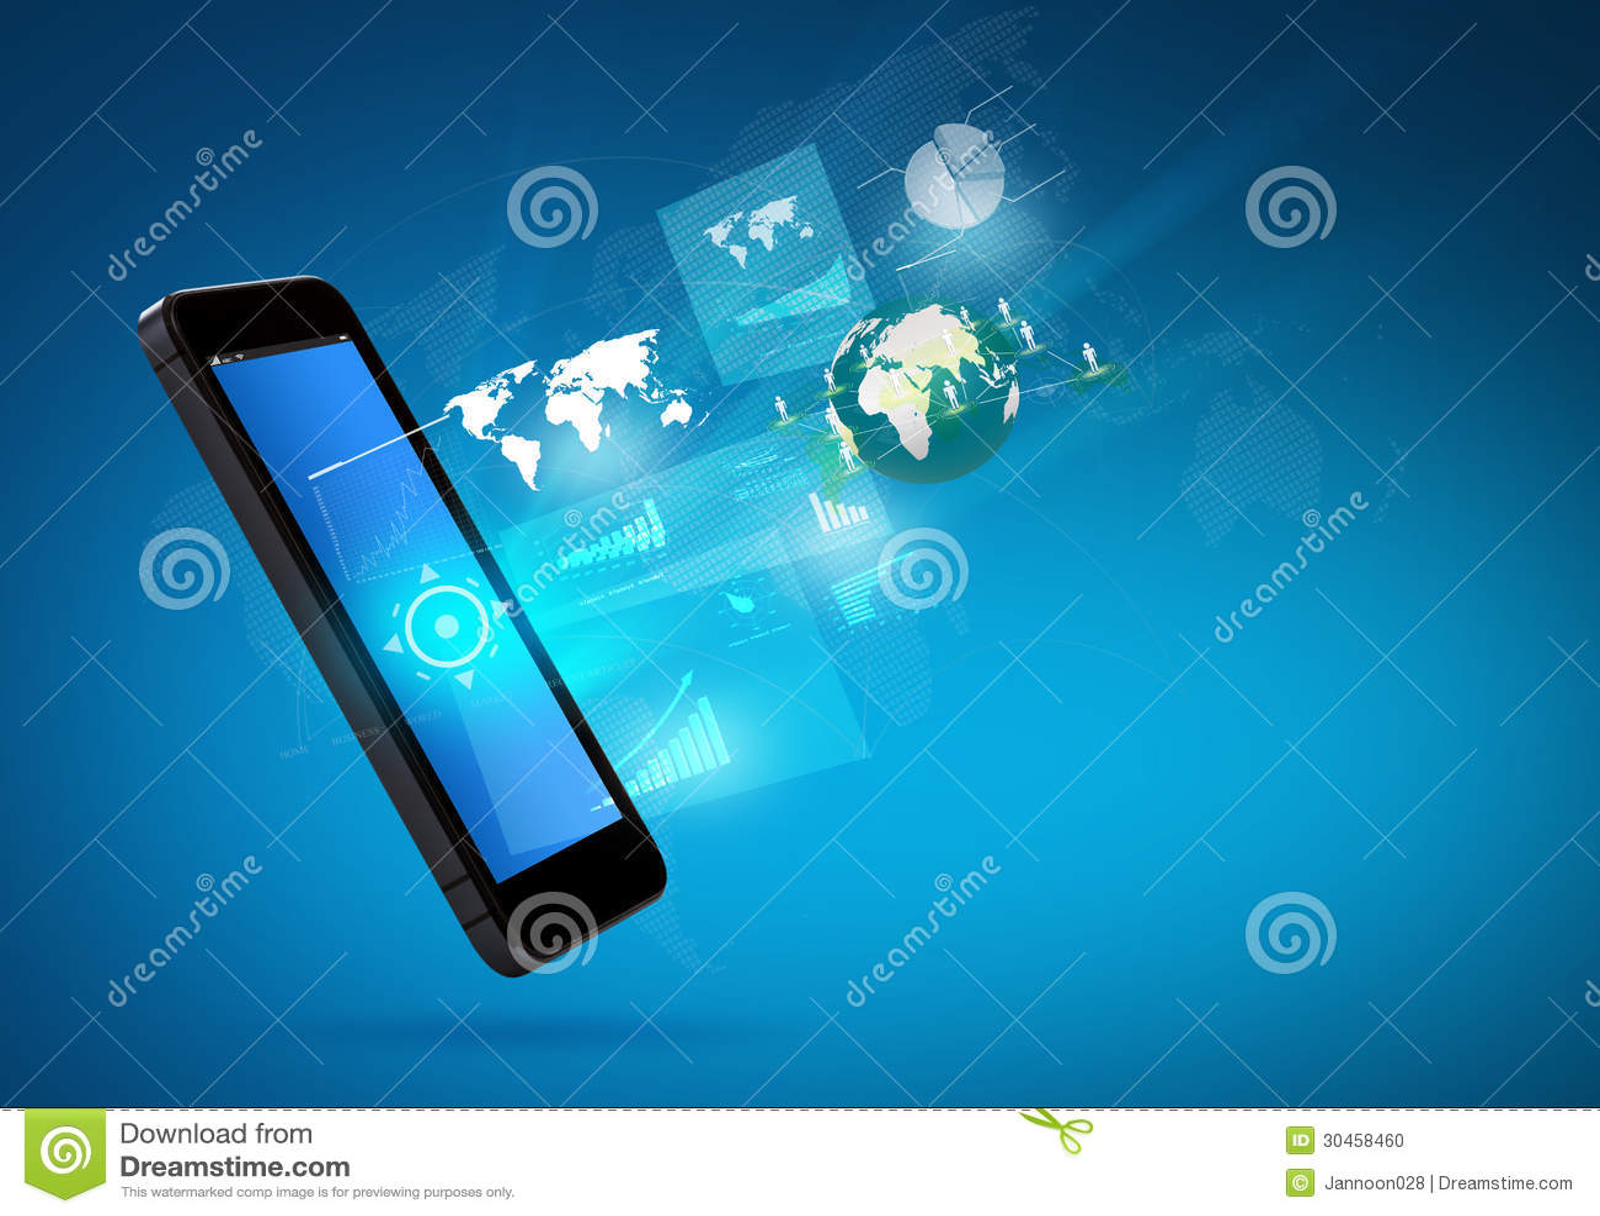 Smartphone innovation: Where we're going next (Smartphones Unlocked)